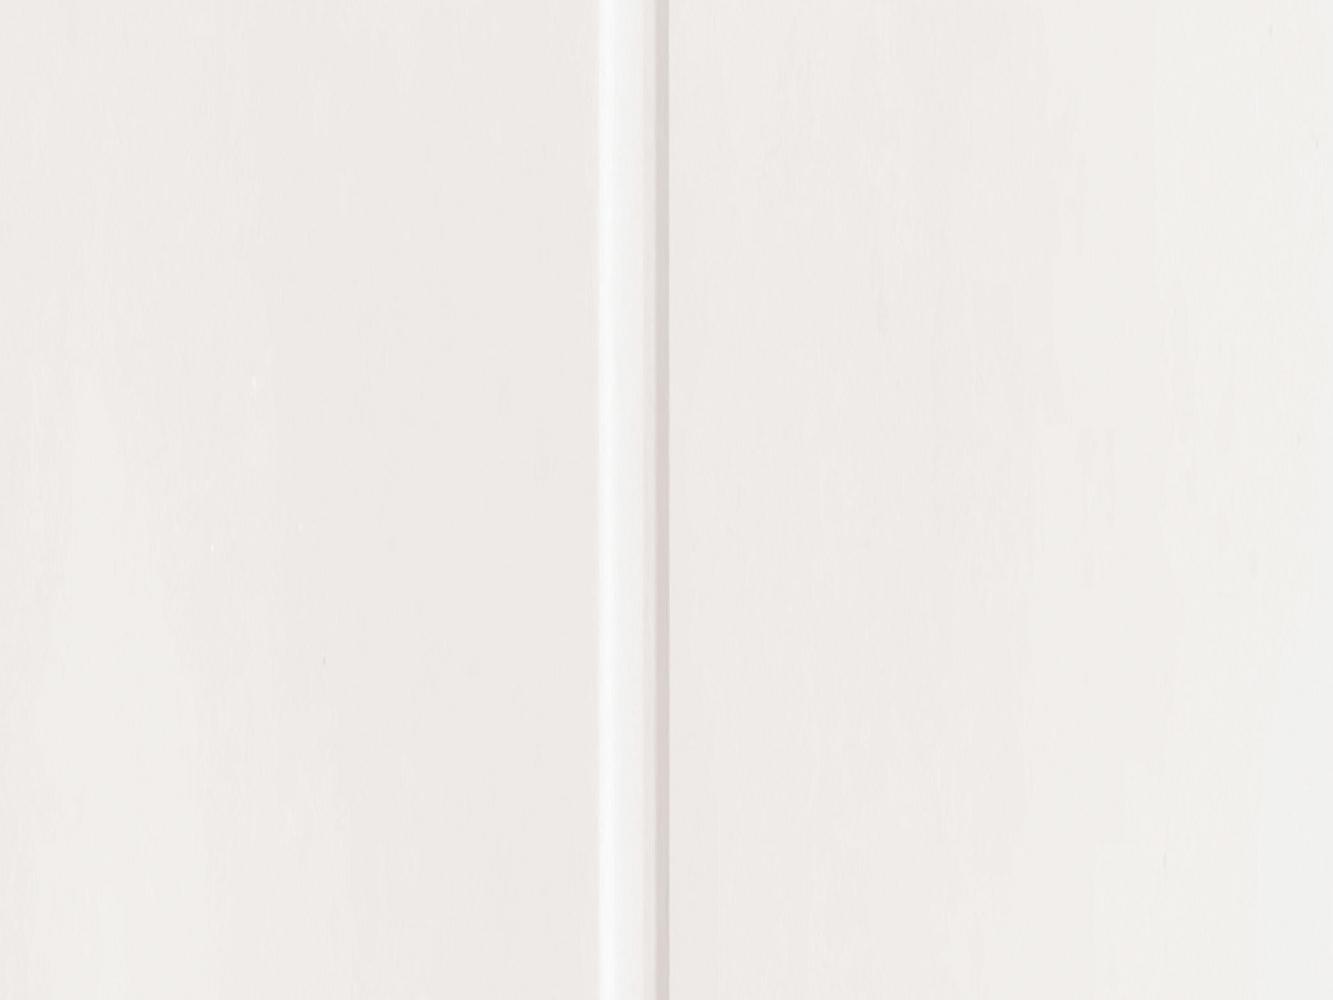 Neptune 250mm white cladding 8.5mm pvc